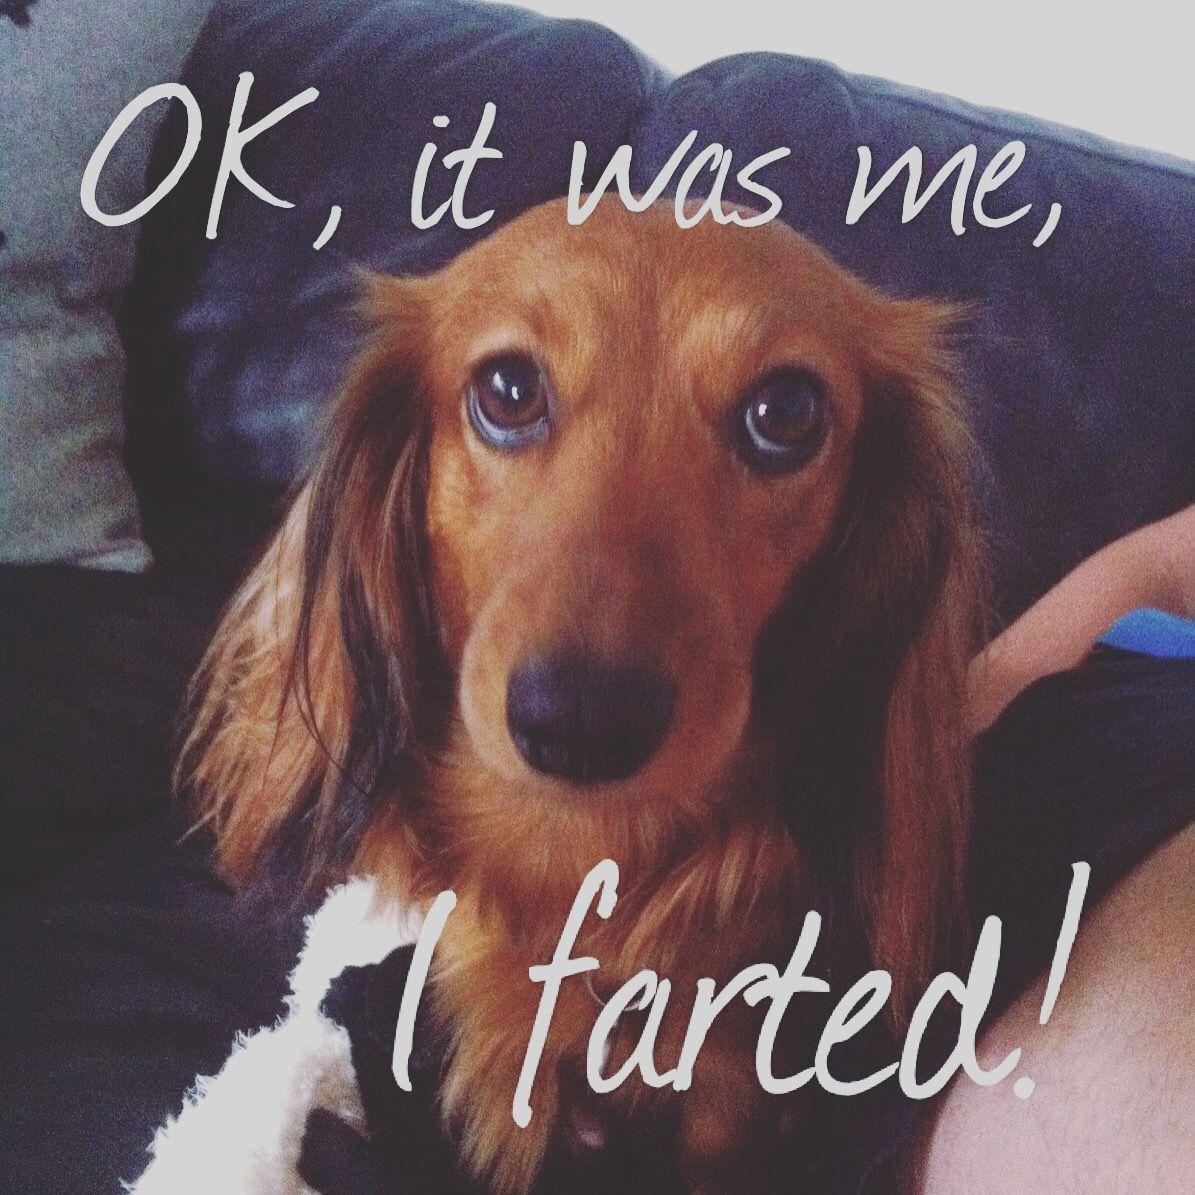 dachshund dackel teckel gravhund (With images